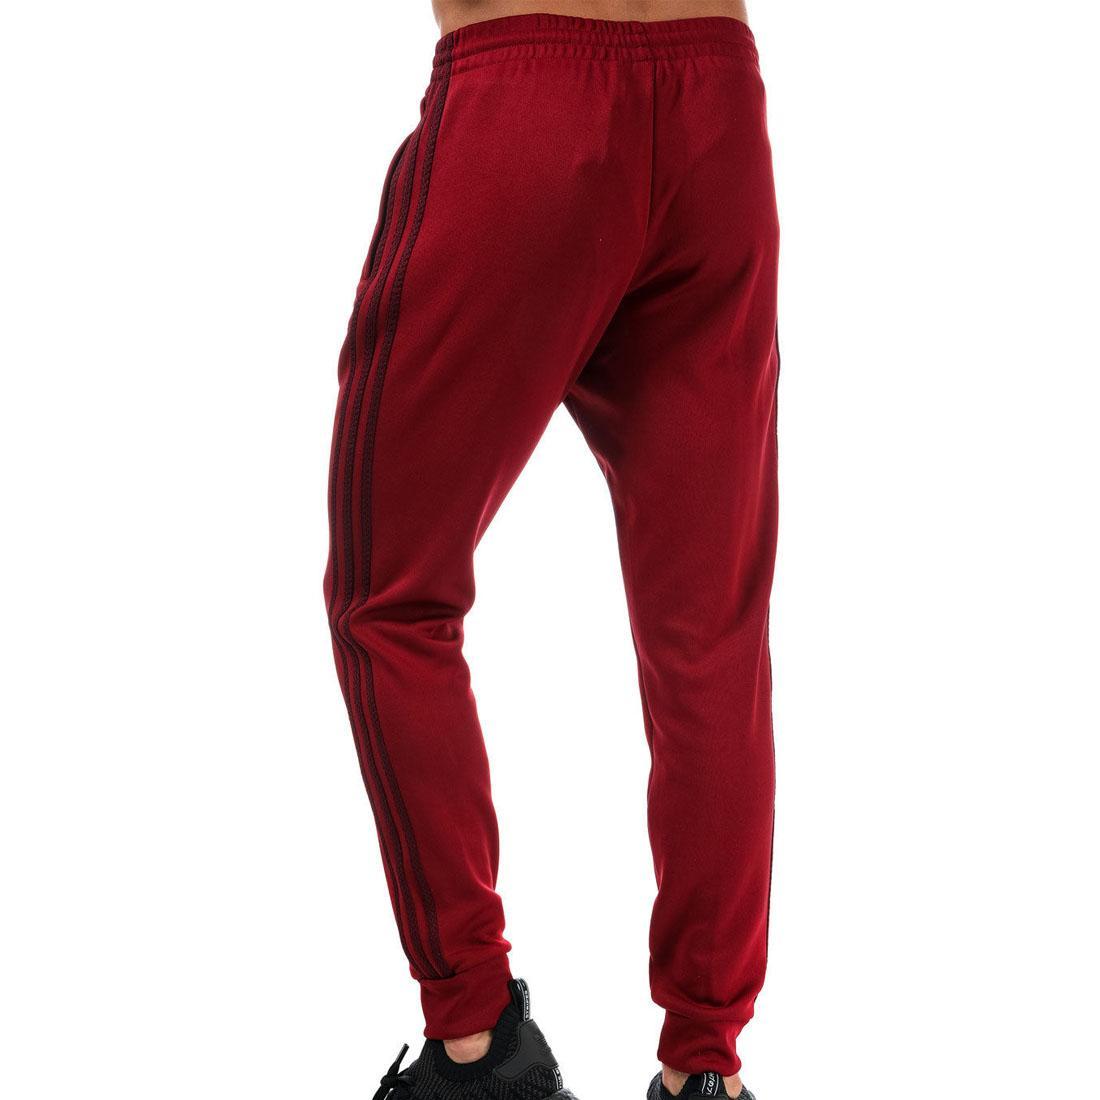 fae9fa594353 Details about adidas originals Mens Burgundy Tracksuit Pants Classic Slim  Fit Bottoms XS